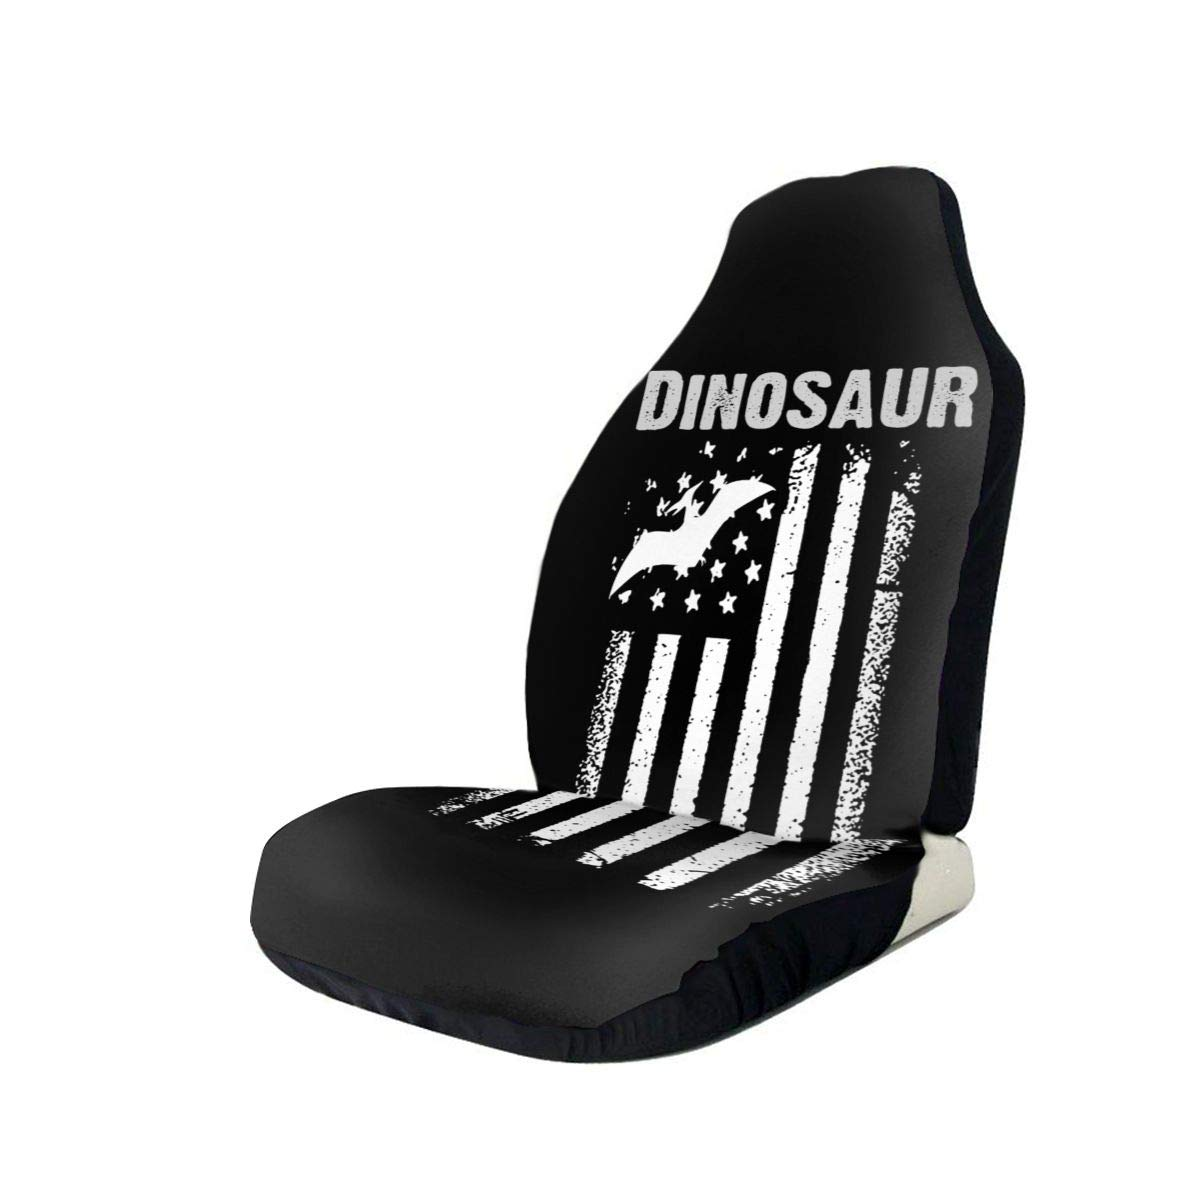 Dinosaur America Flag Car Seat Covers 3D Universal for Japan Maker New Bargain Vehicles